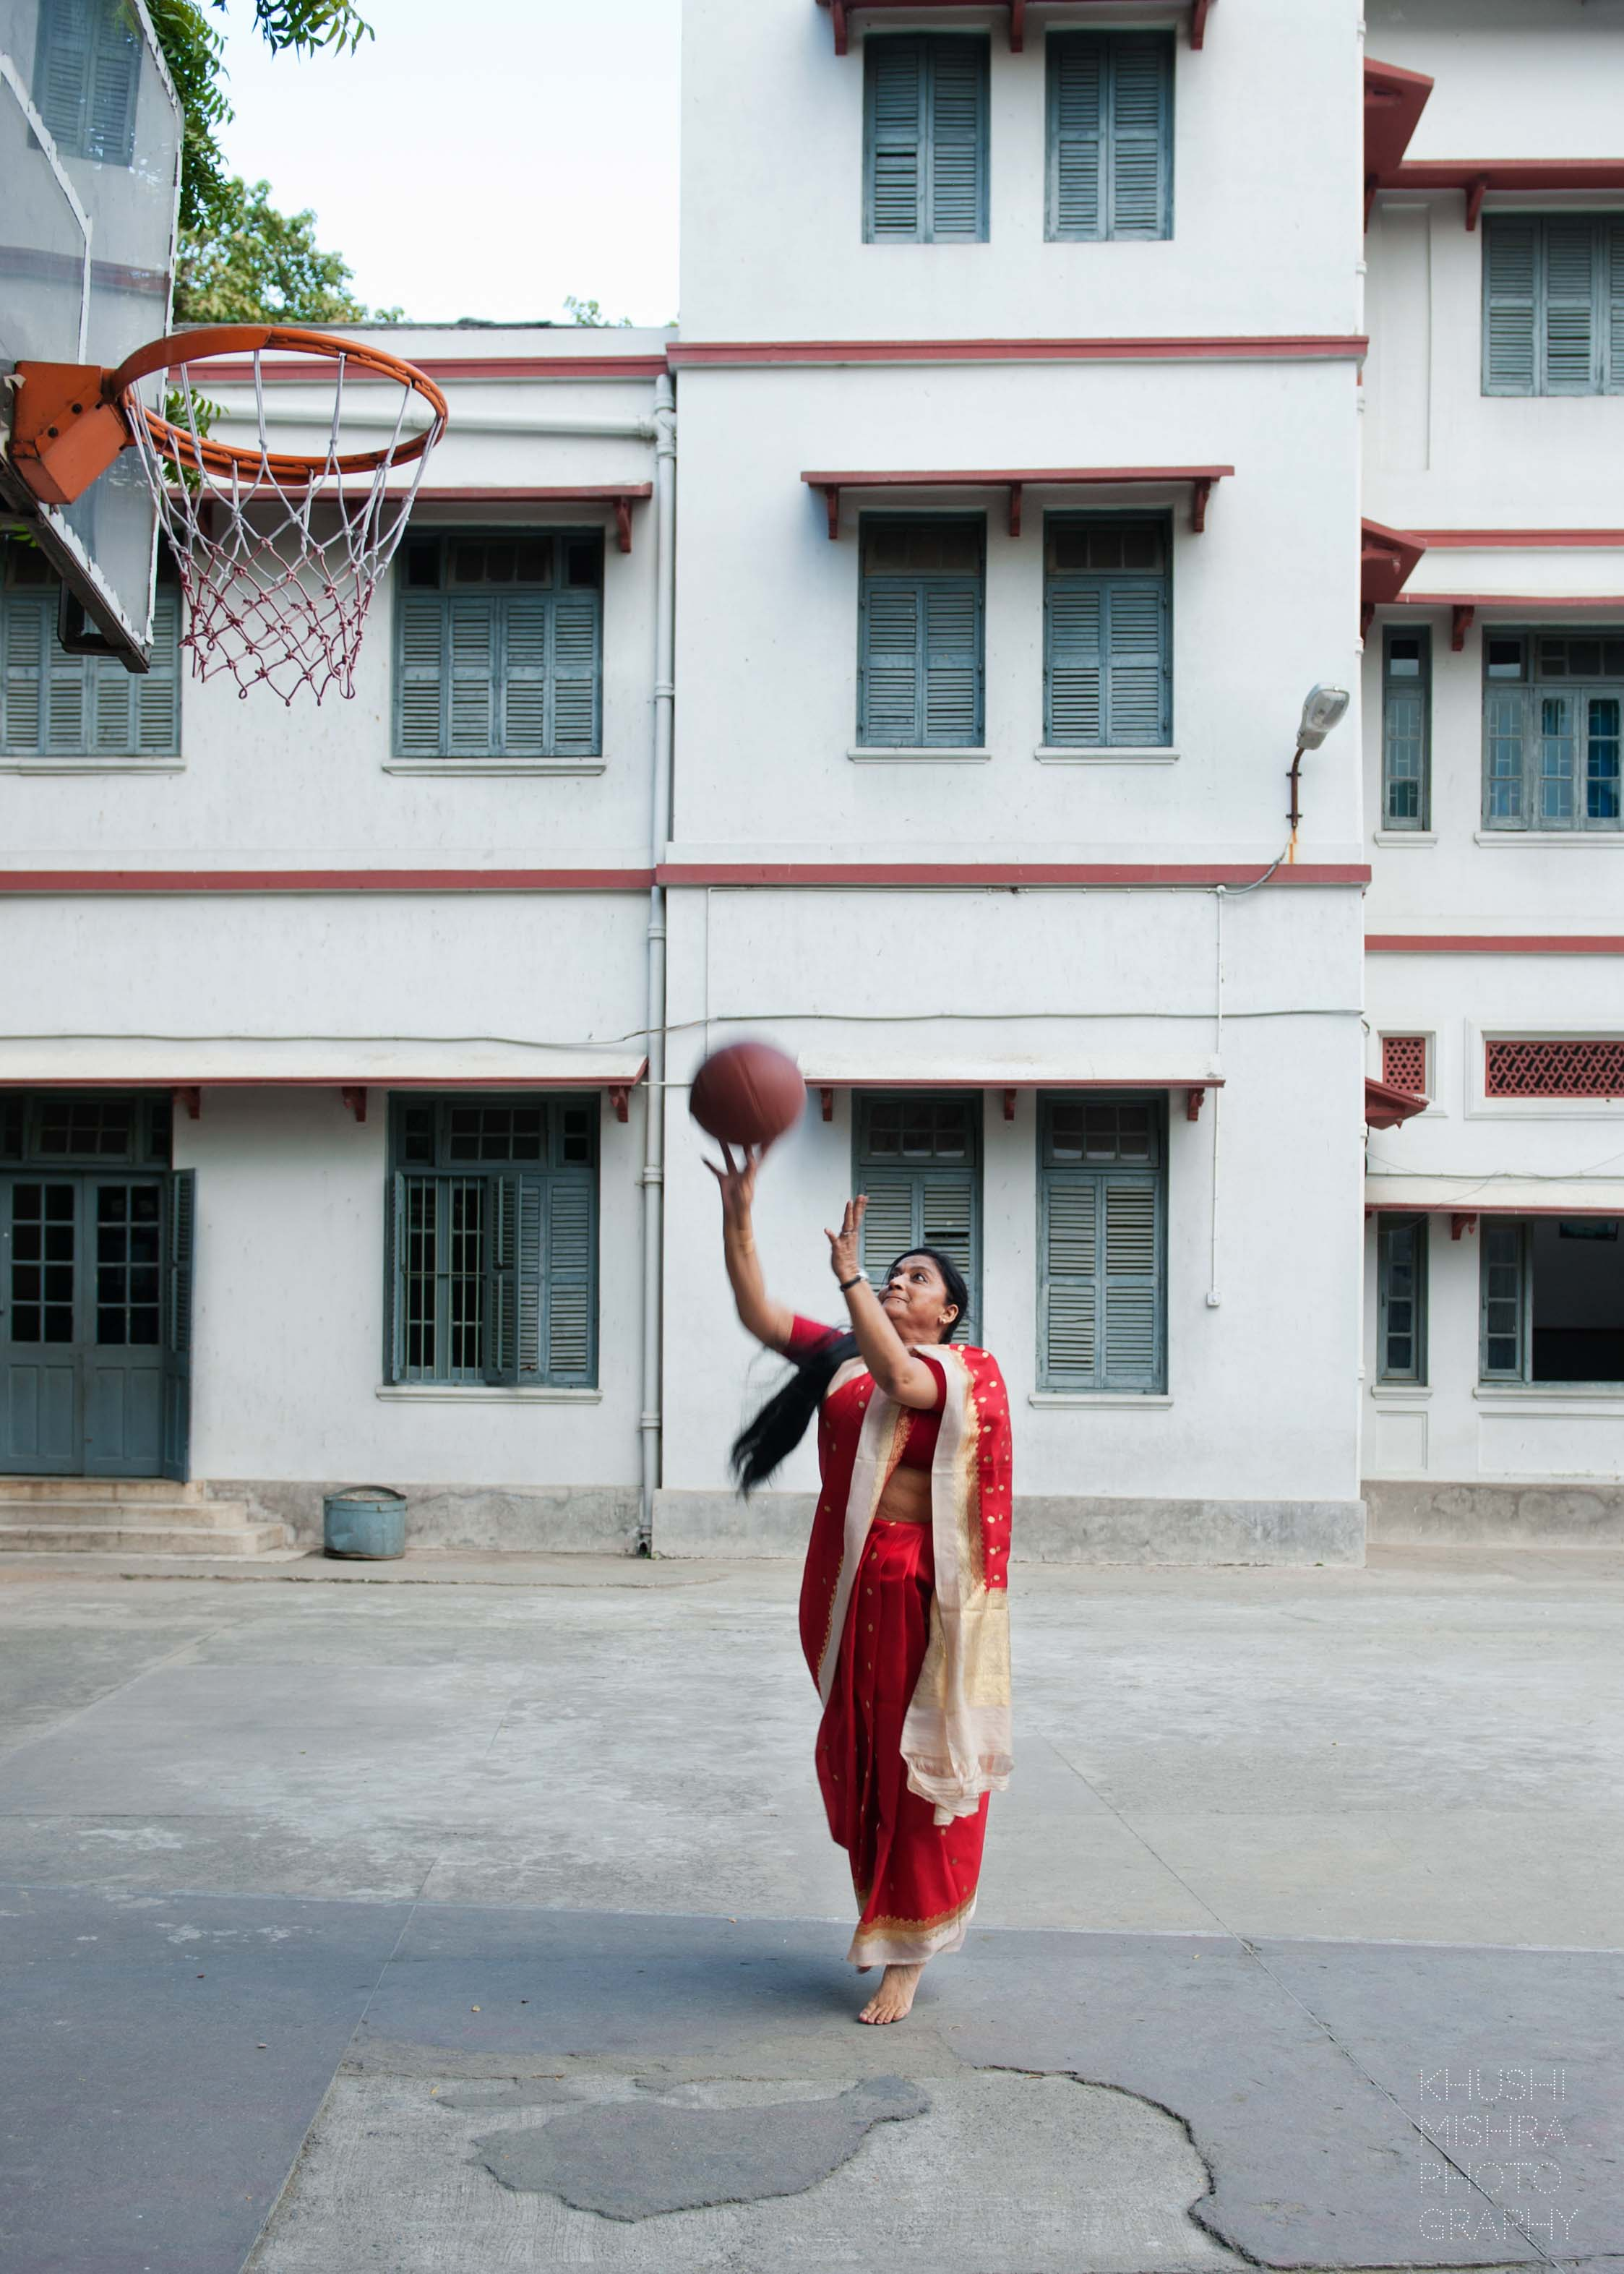 The Banarasis_Khushi Mishra Photography_6_DSC_3737.jpg